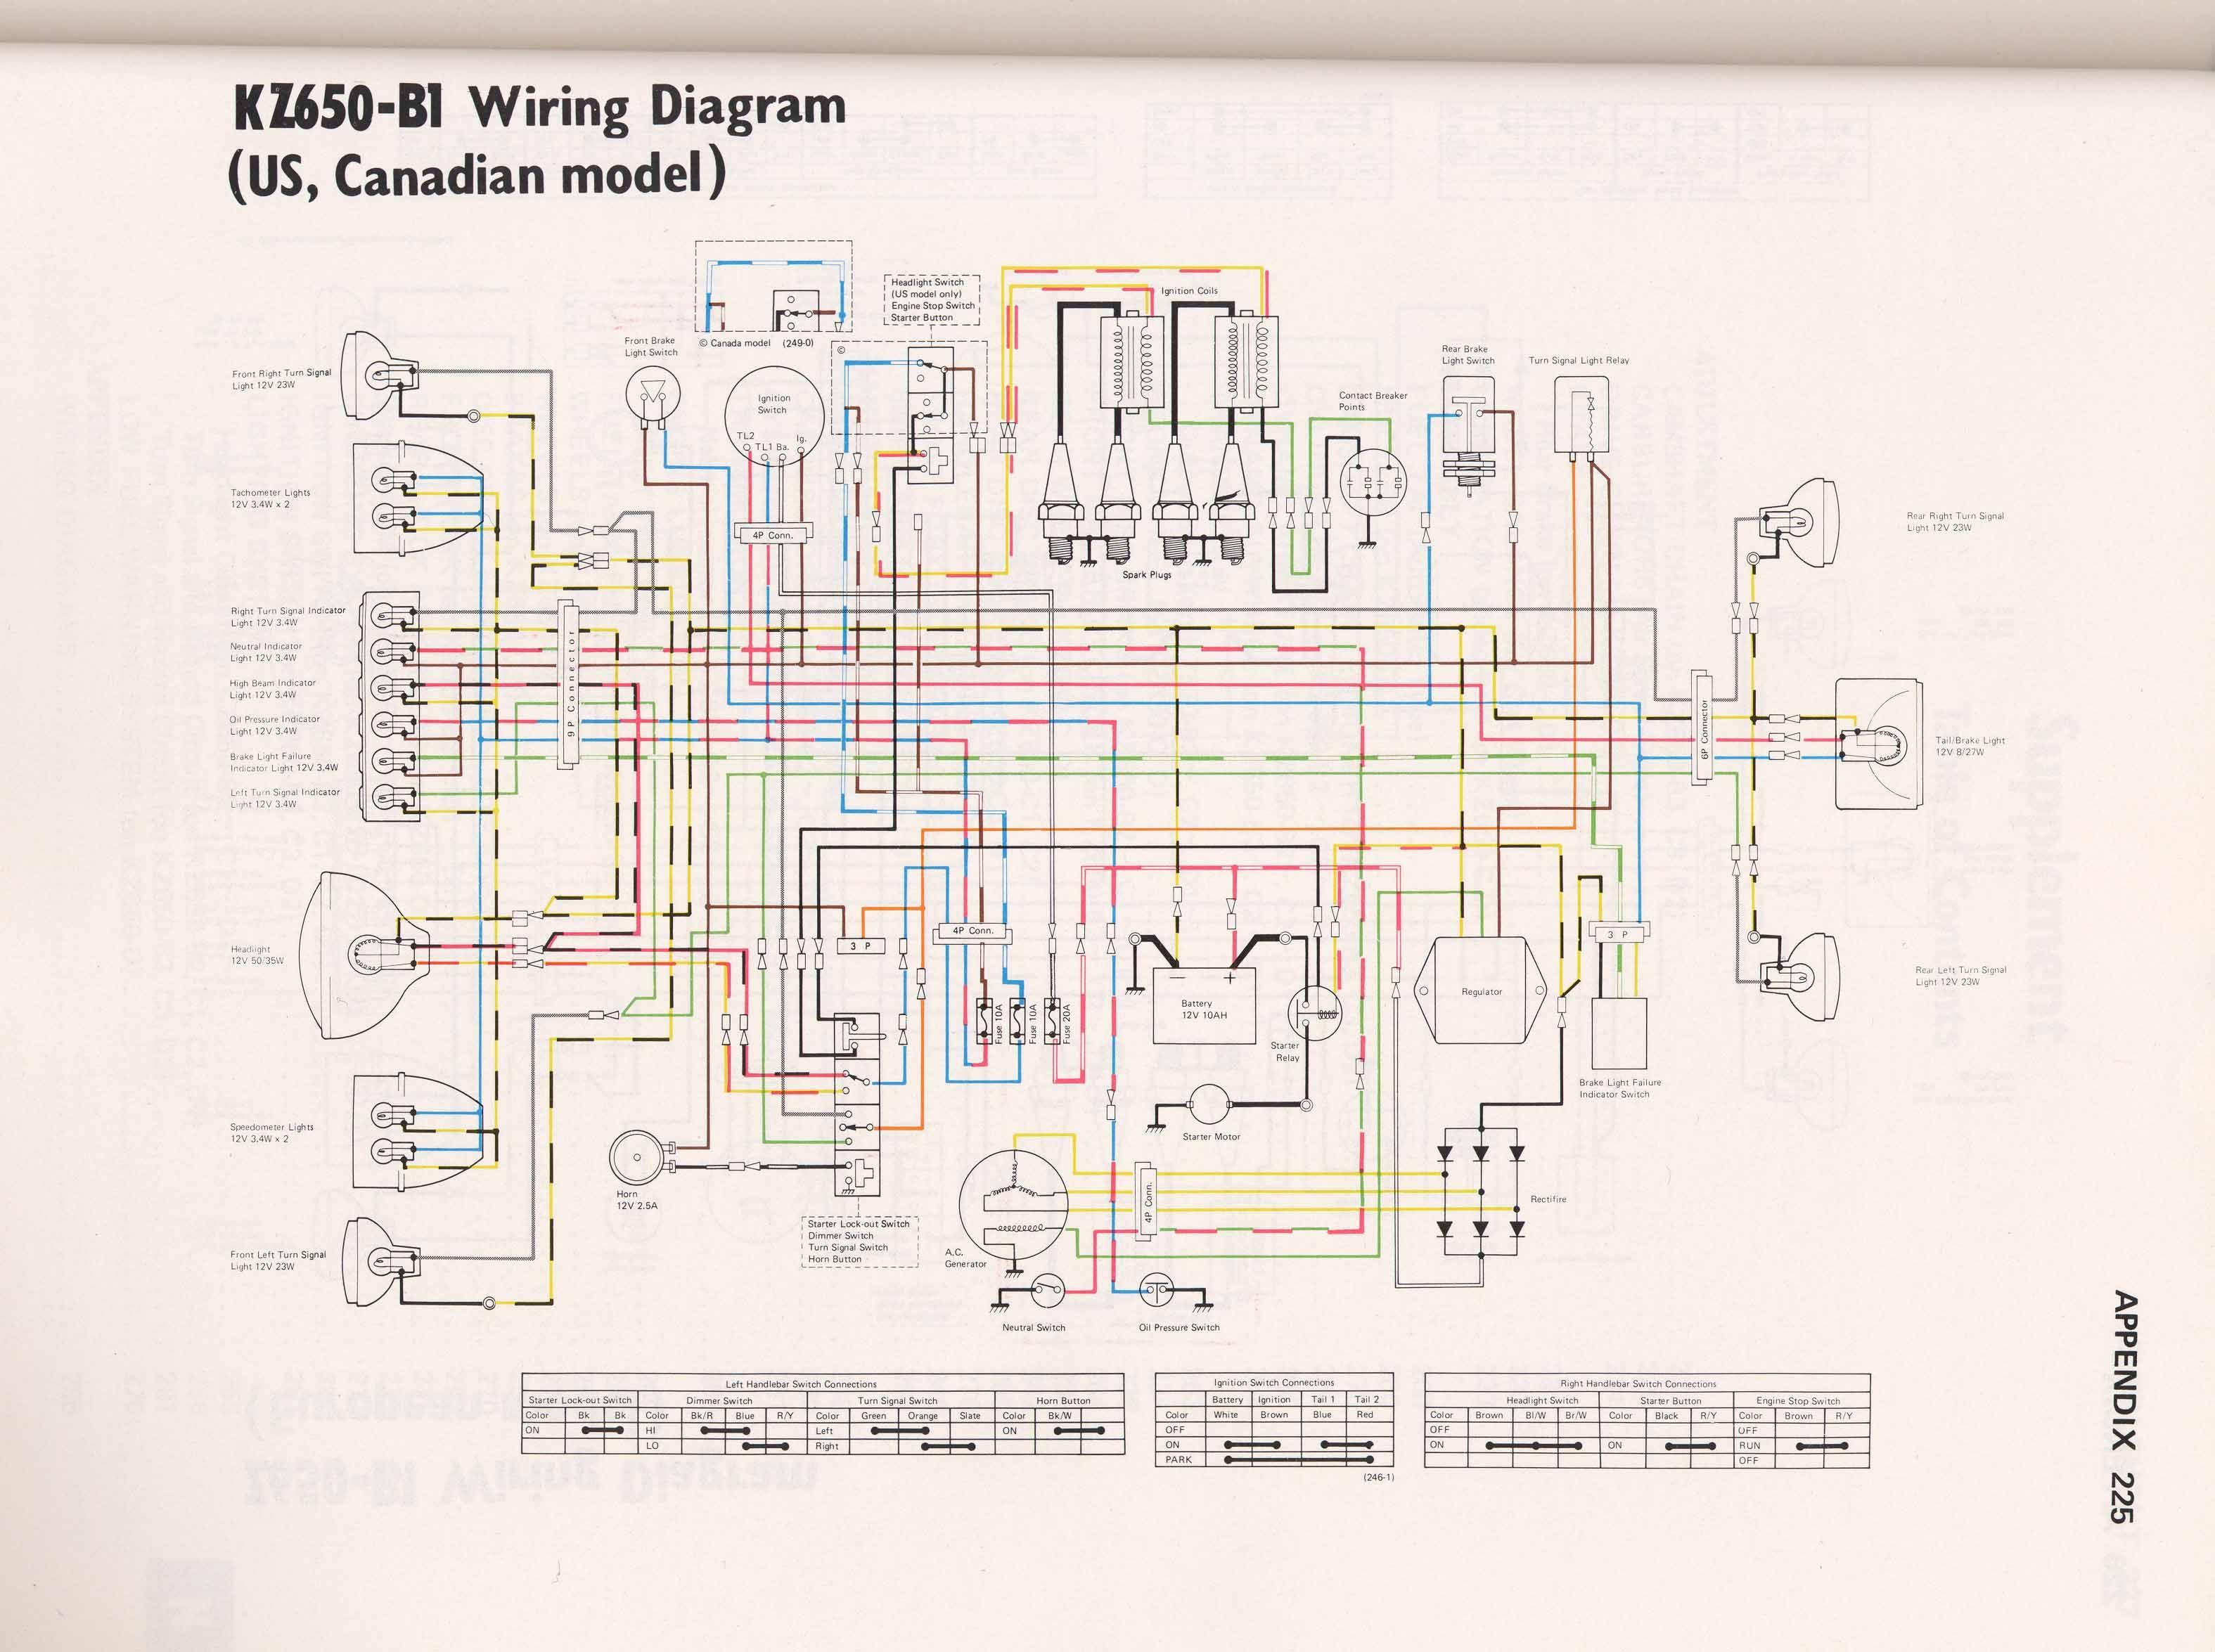 Pin By Juha H On Z650 Electrical Wiring Diagram Diagram Yamaha